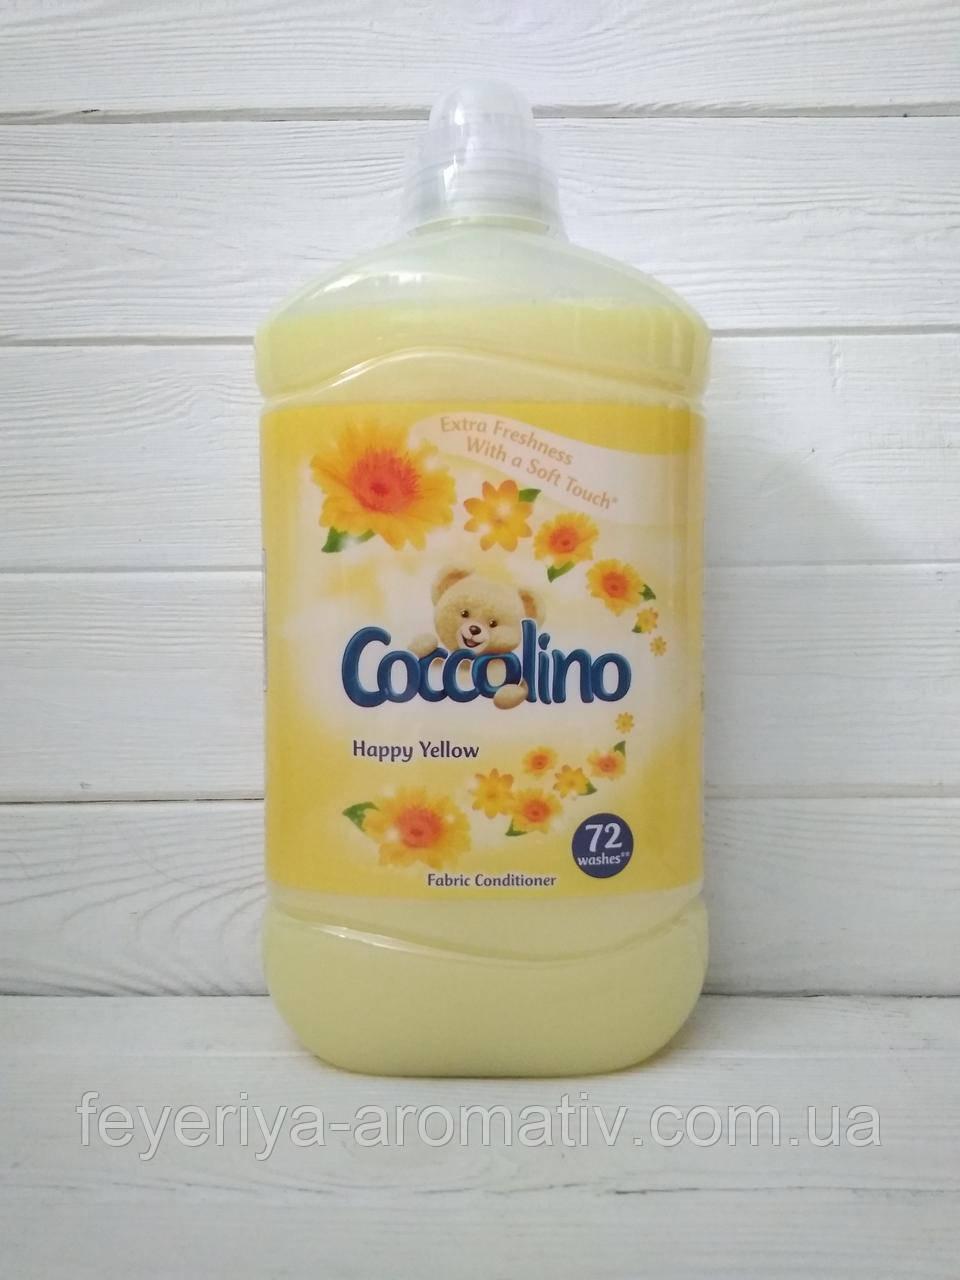 Кондиционер для белья Coccolino Happy Yellow 1.8л (72 стирки)